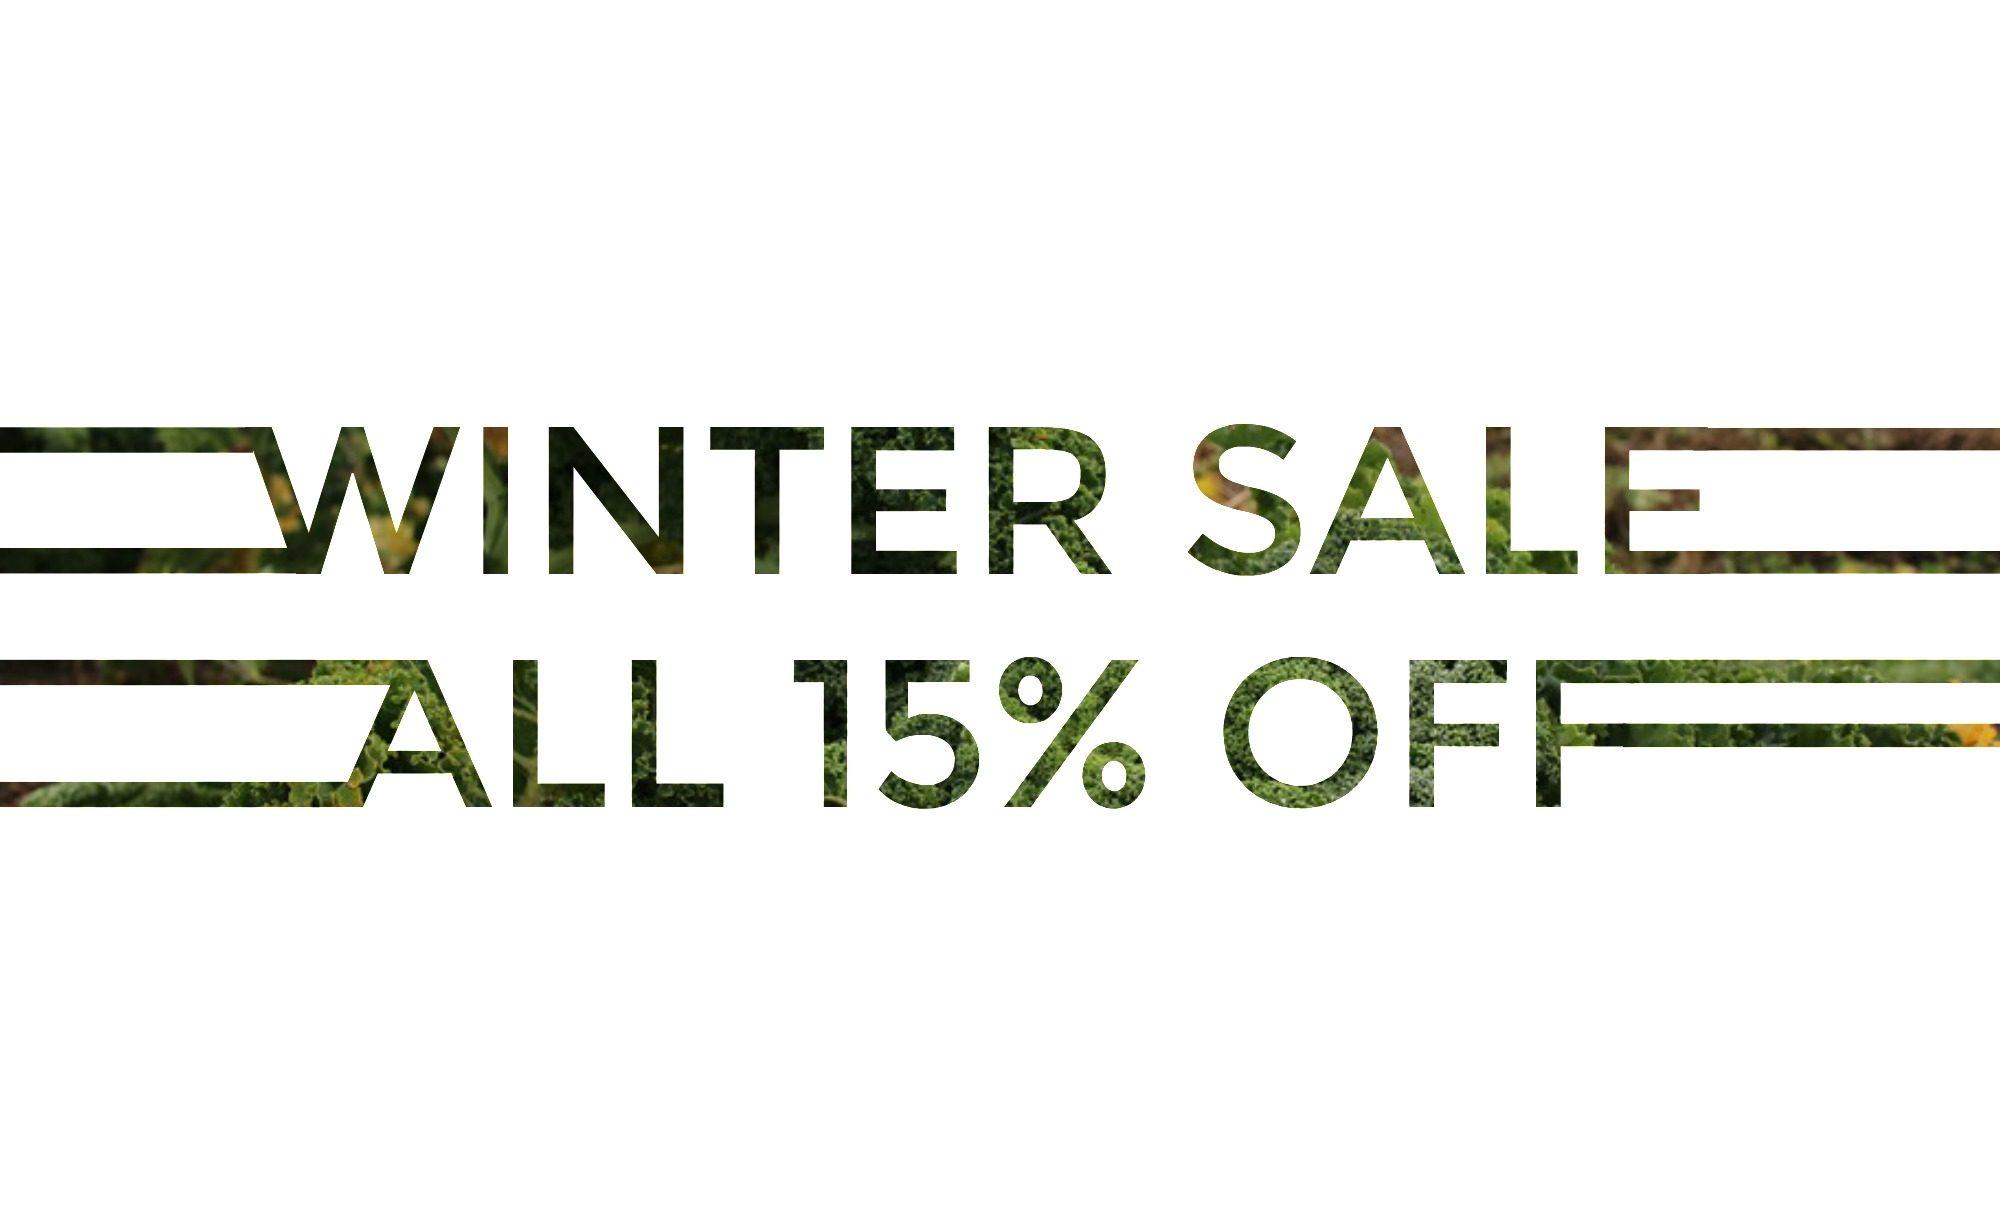 Winter Sale 4